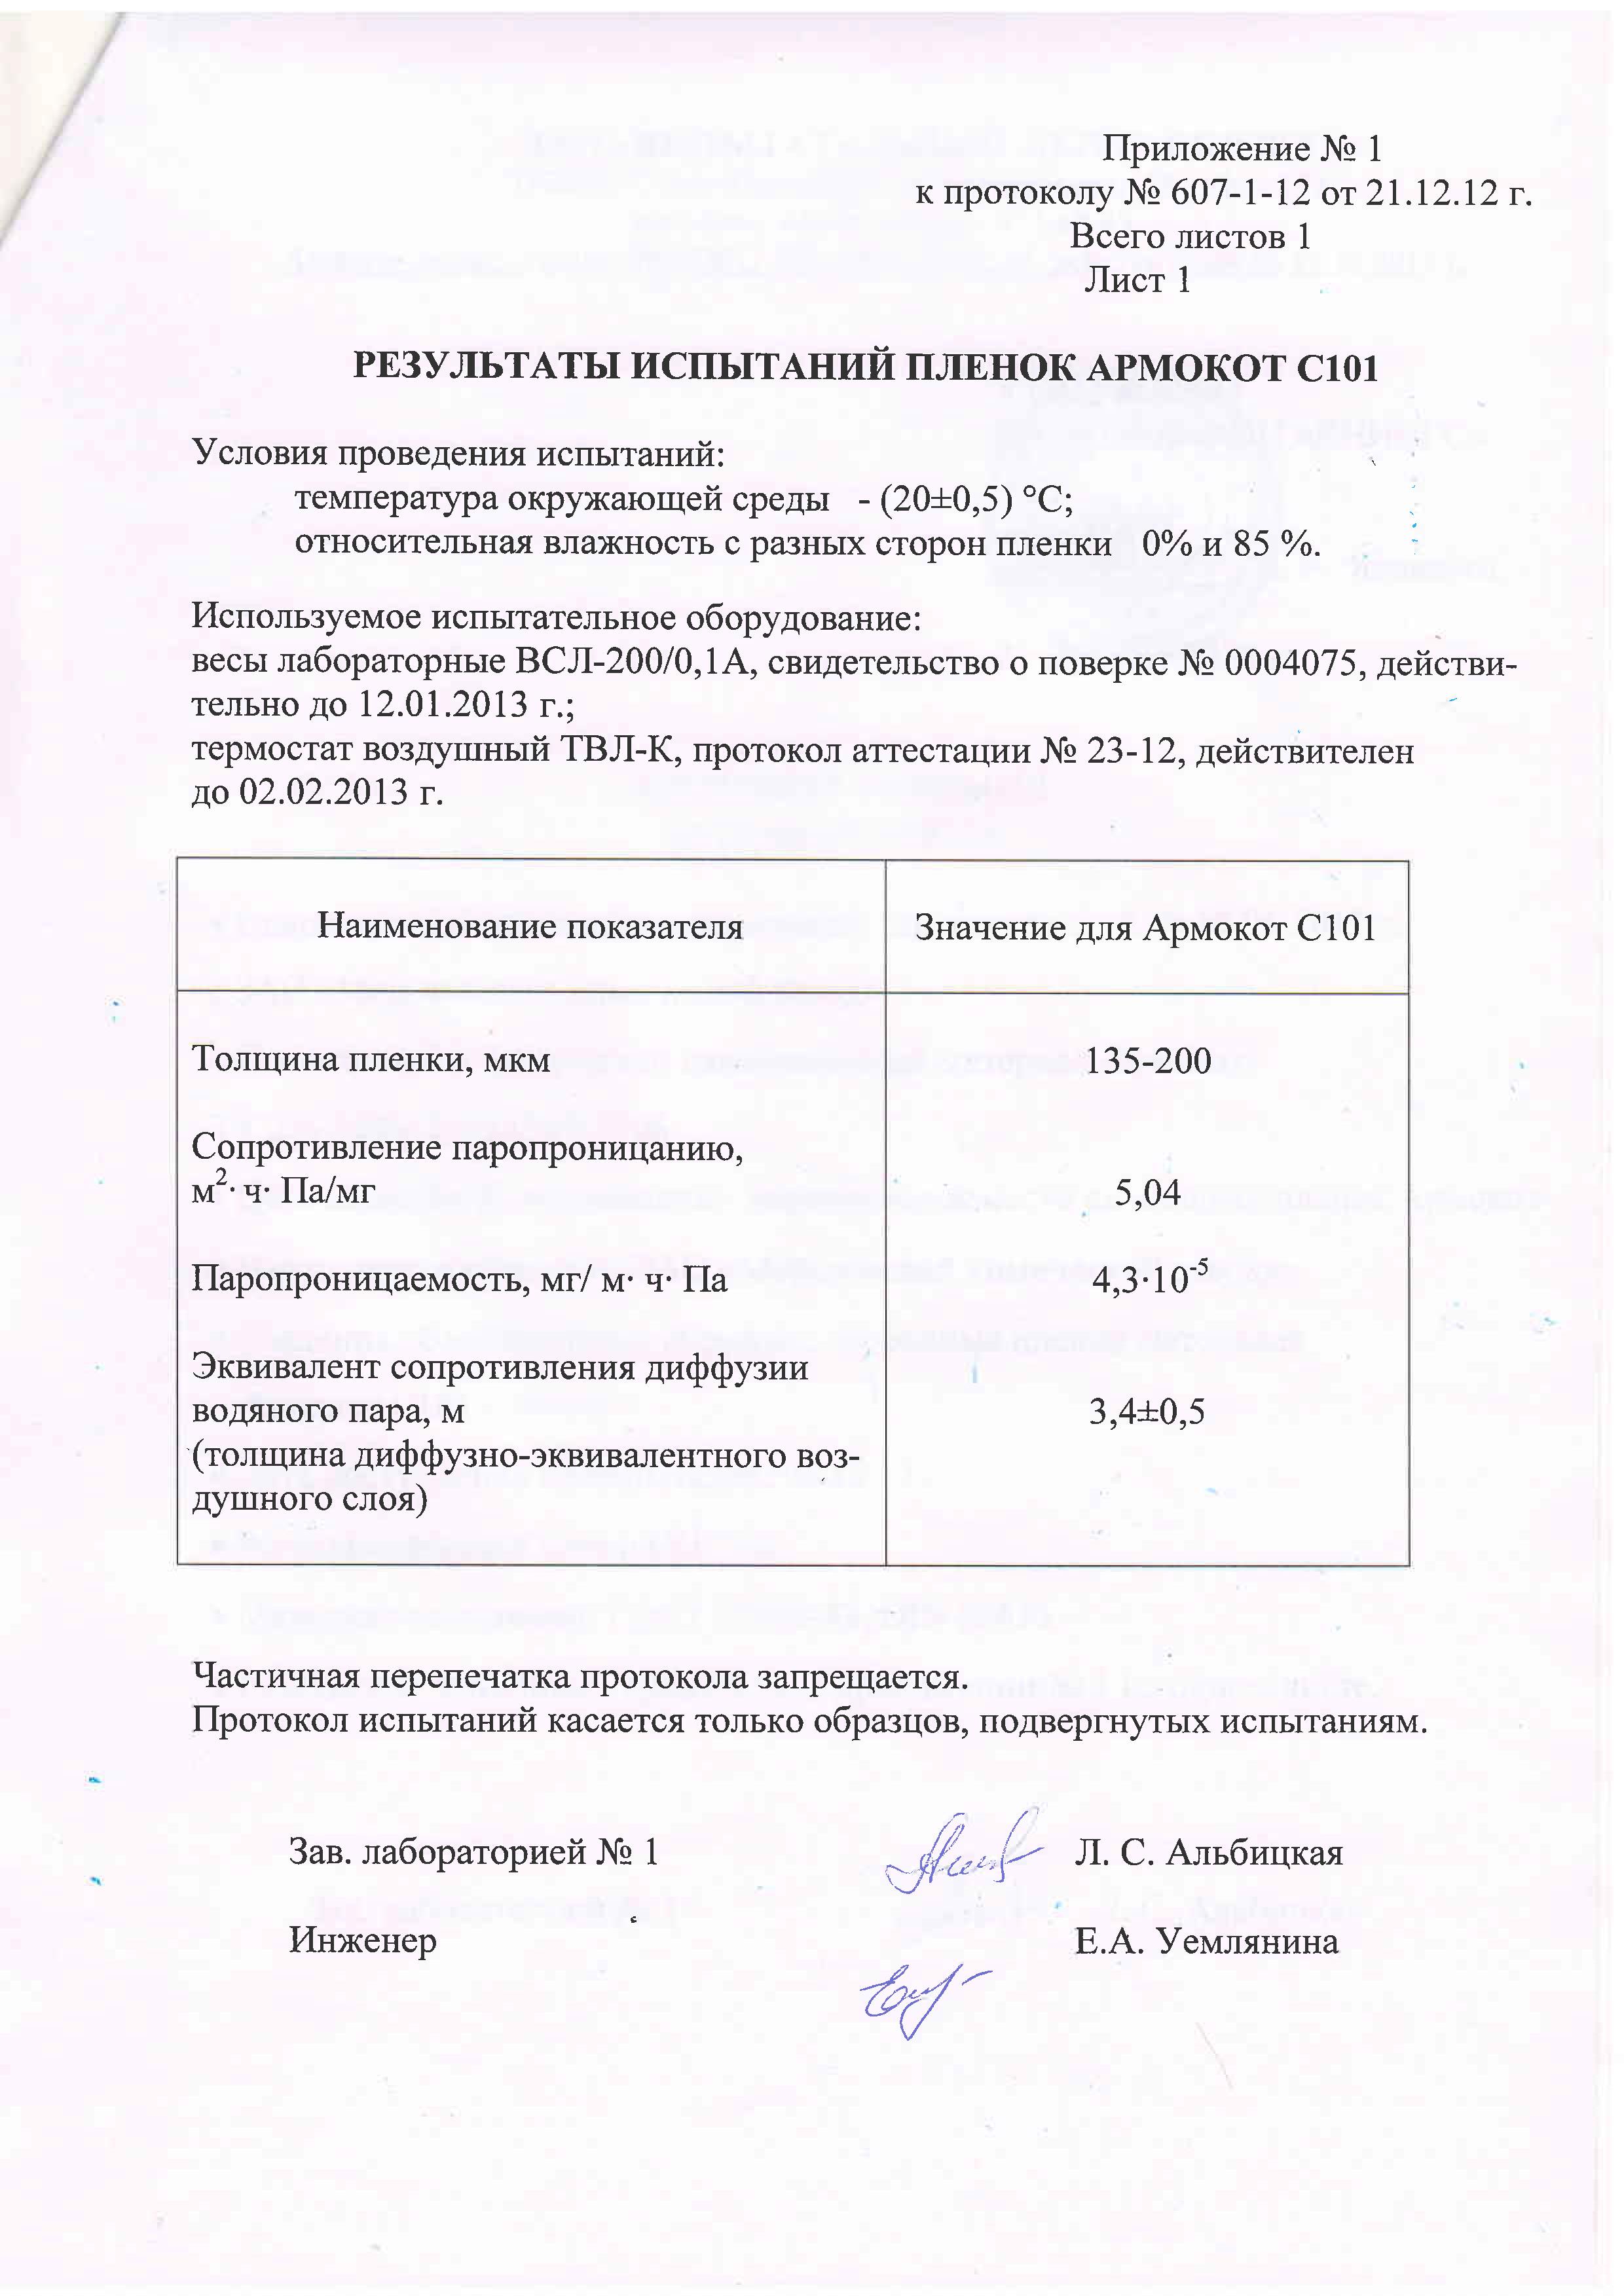 Армокот С101-мокрый способ_Страница_2